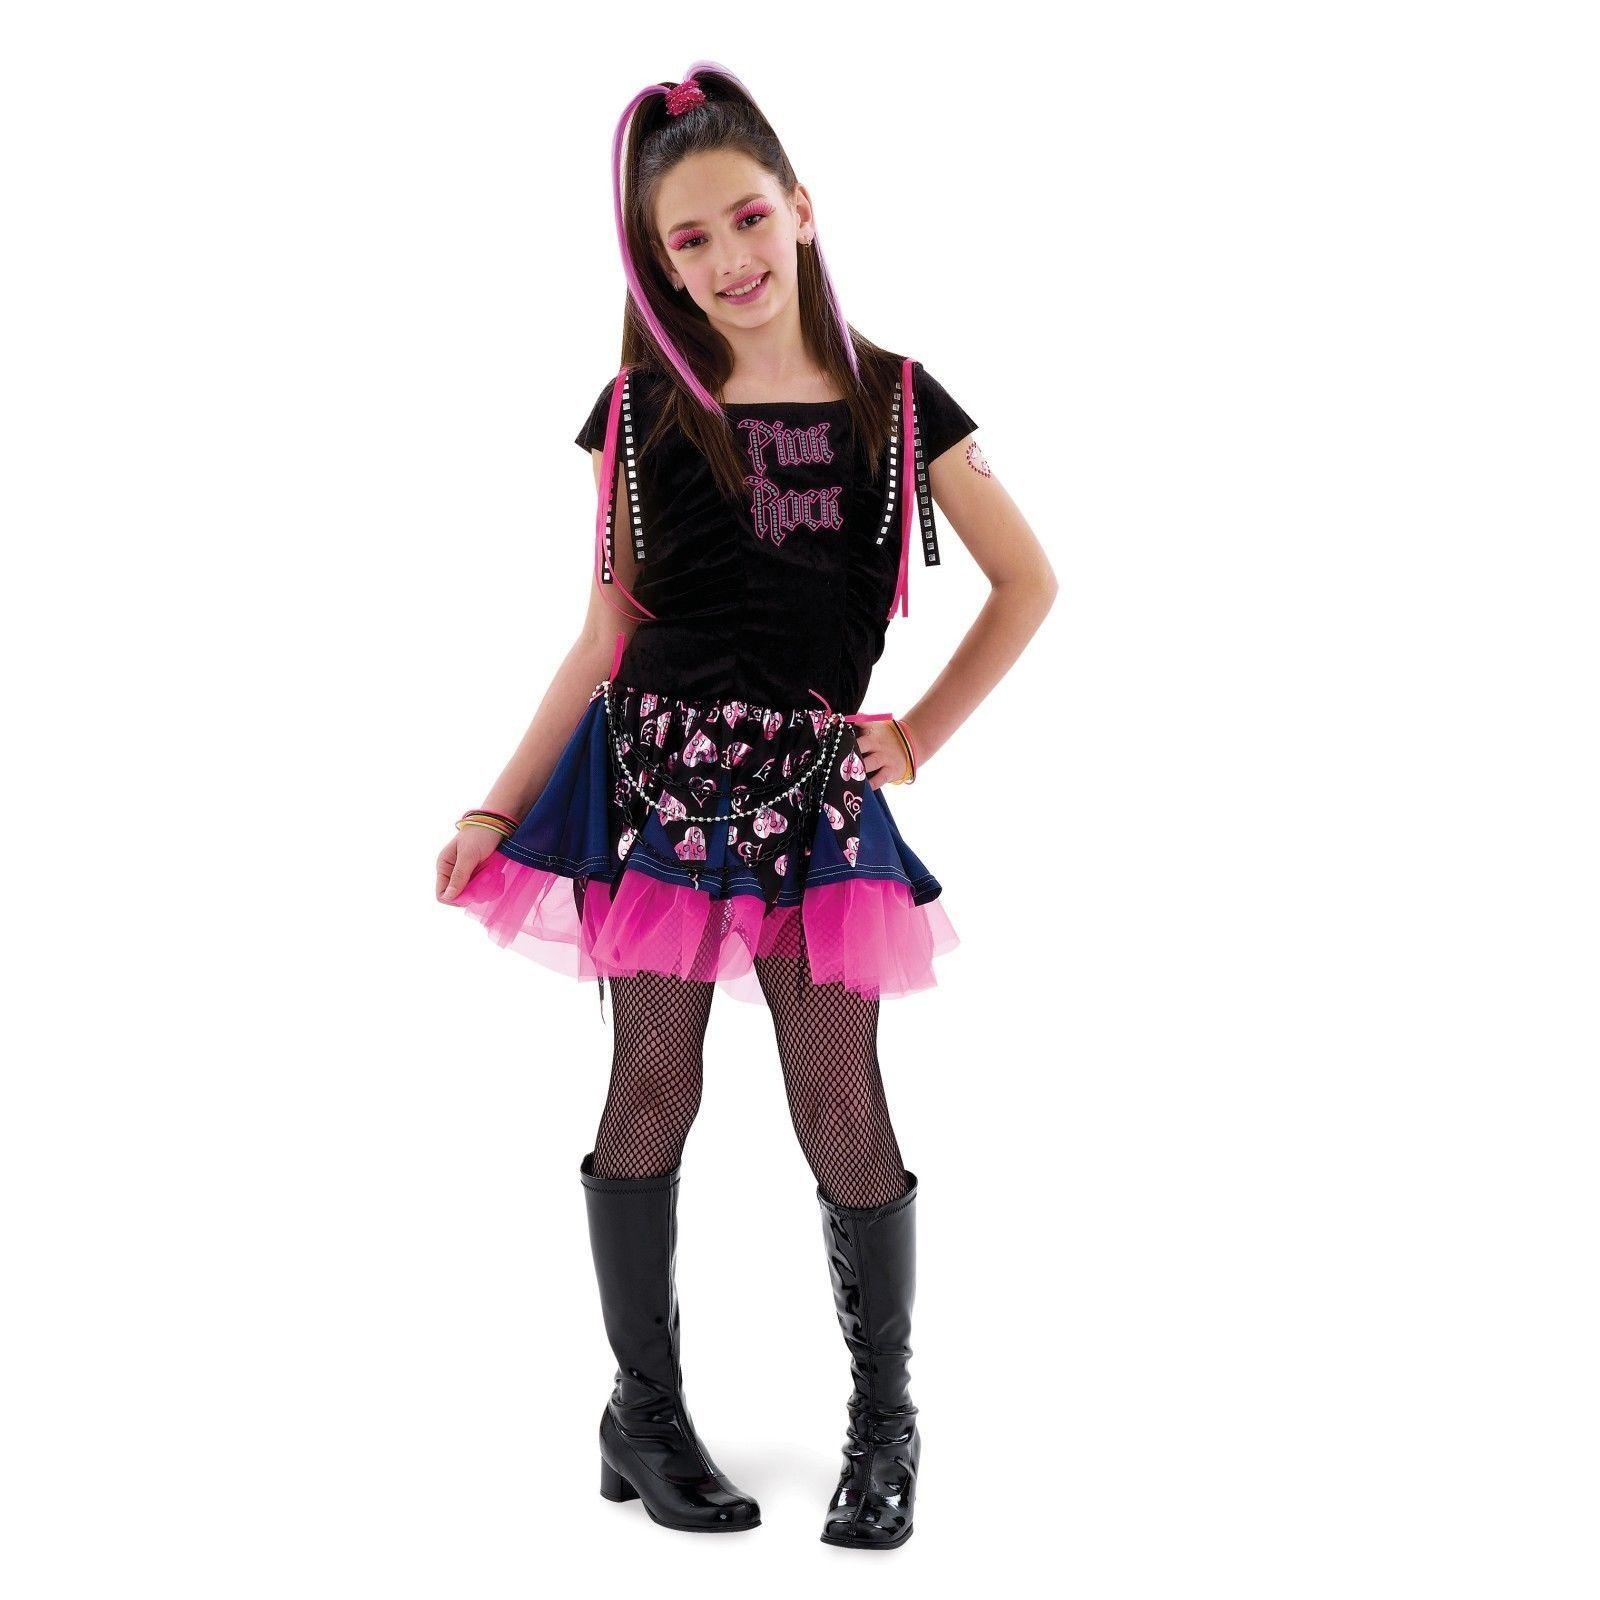 girls 80s rock costume medium 8 10 halloween kids child pink punk 1980s dress ebay - 80s Rocker Halloween Costume